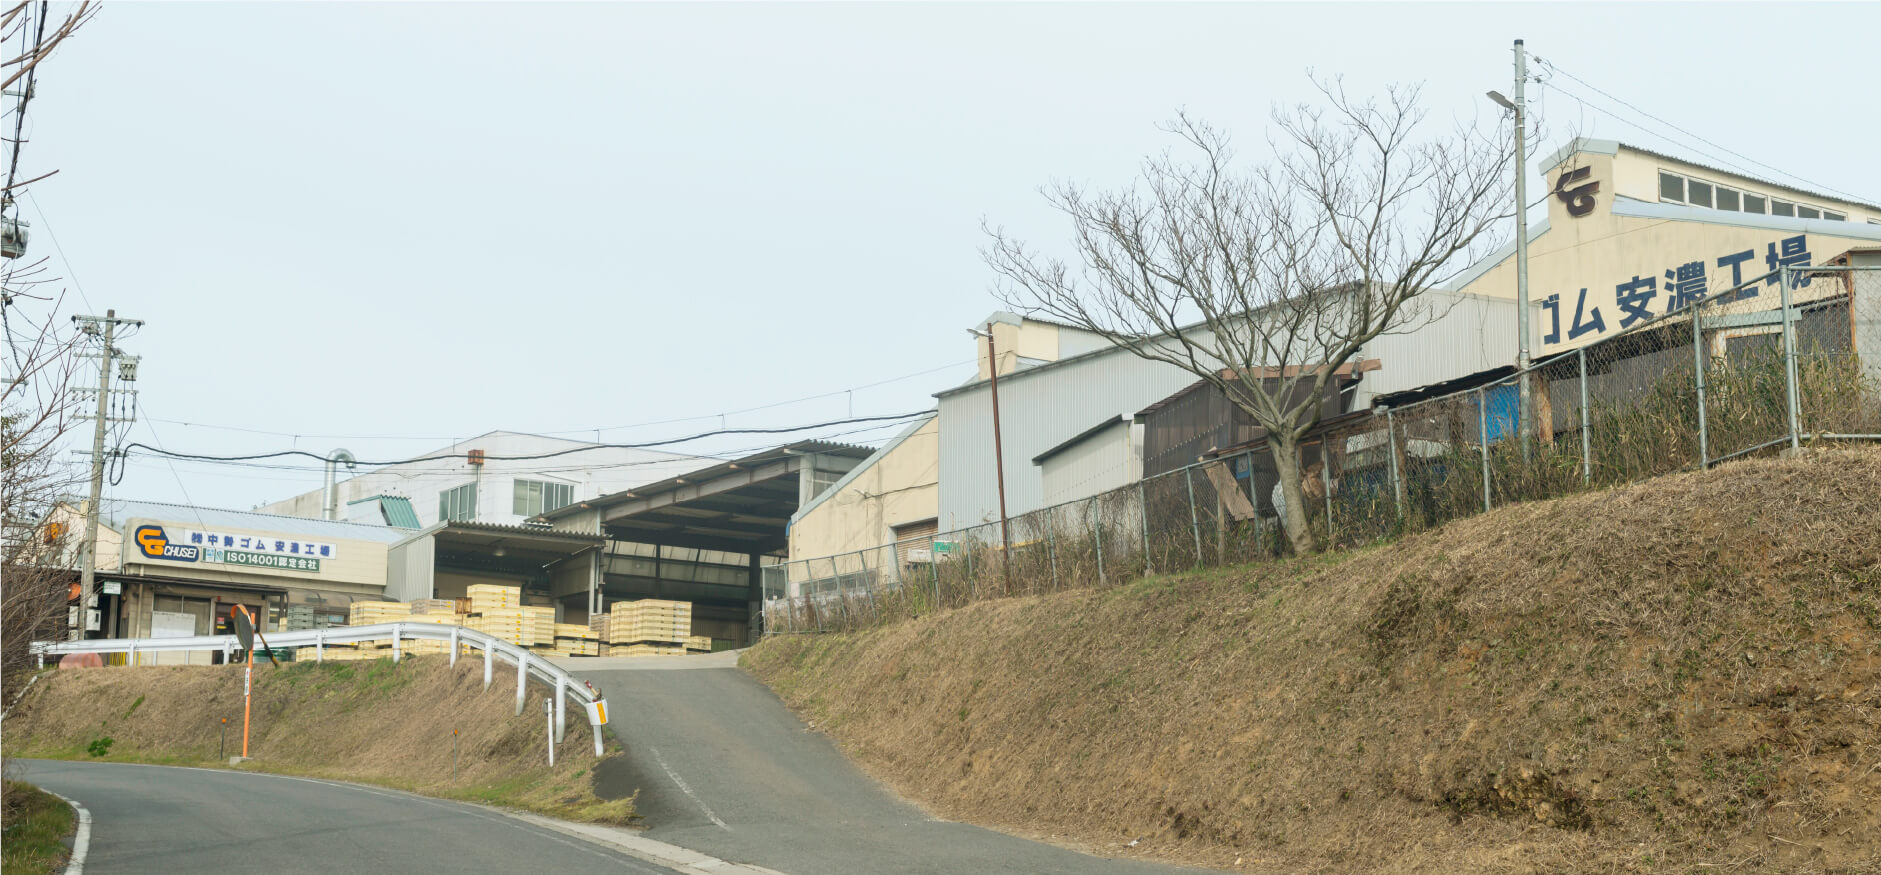 安濃工場 ANO FACTORY